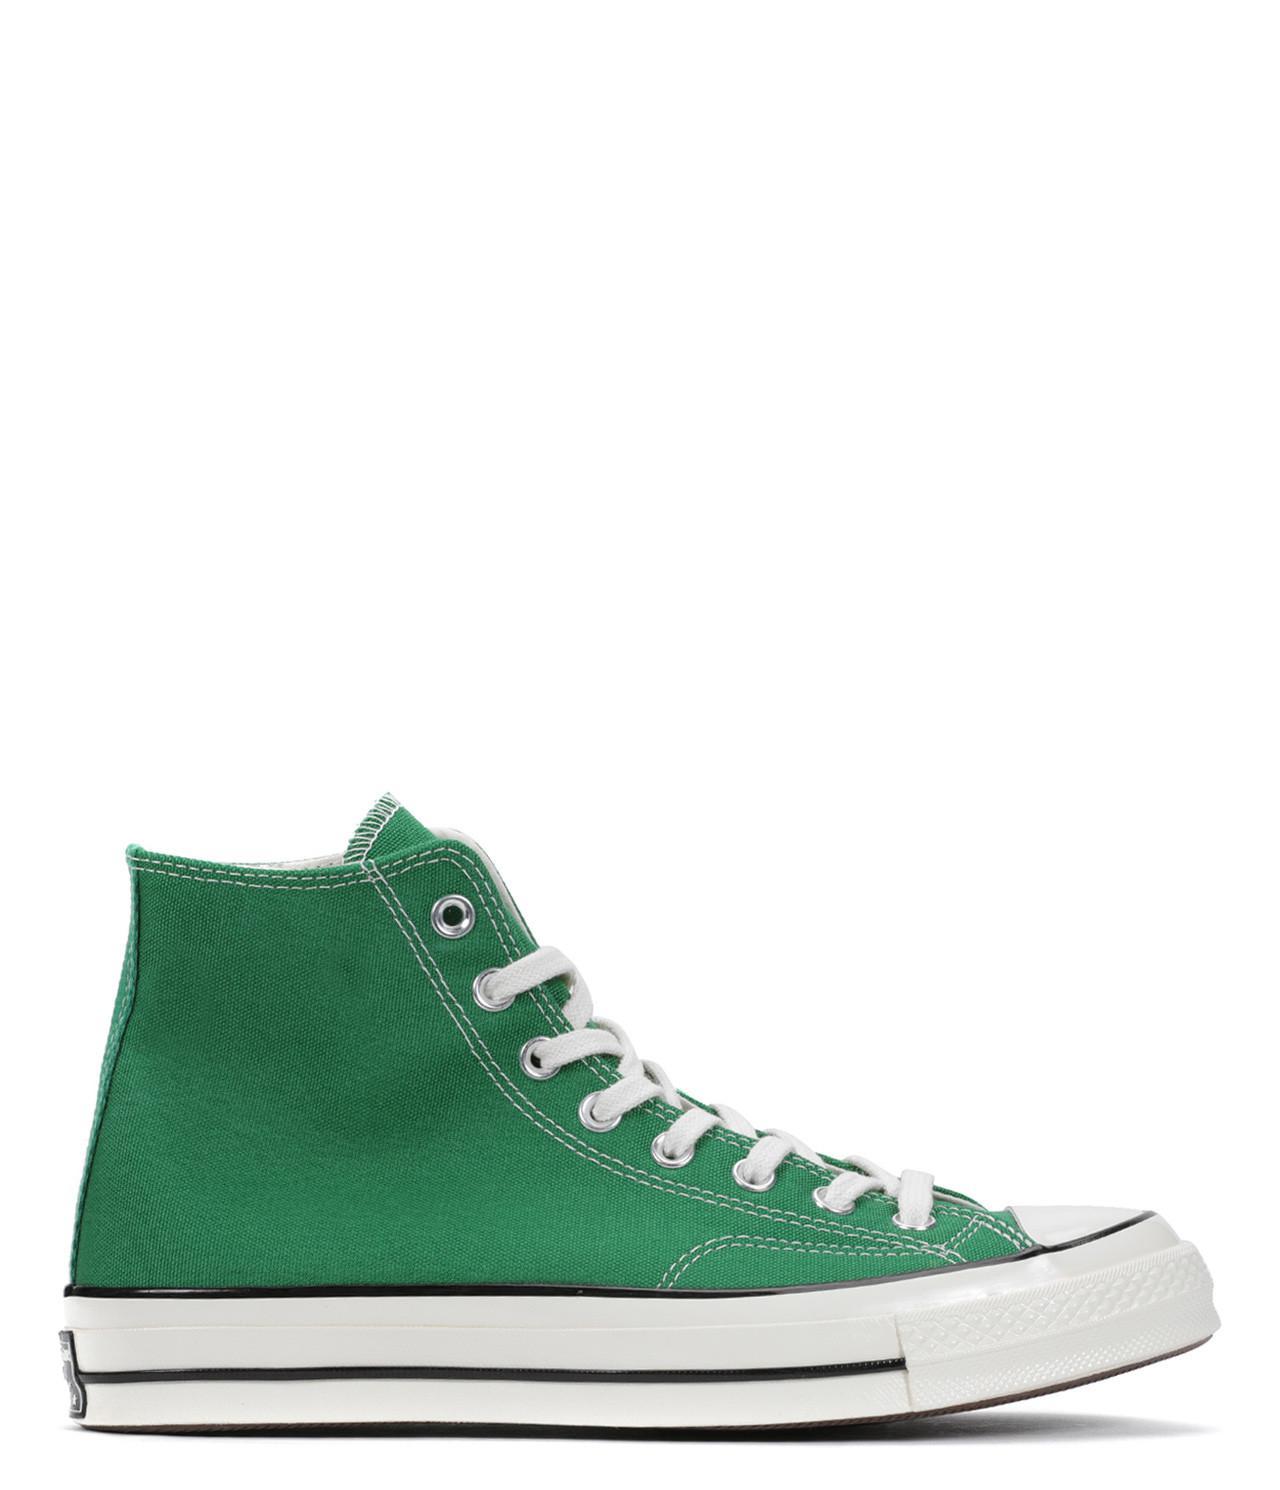 51f7d21b25db83 Converse. Men s Green 1970s Chuck Taylor All Star Canvas High-top Sneakers